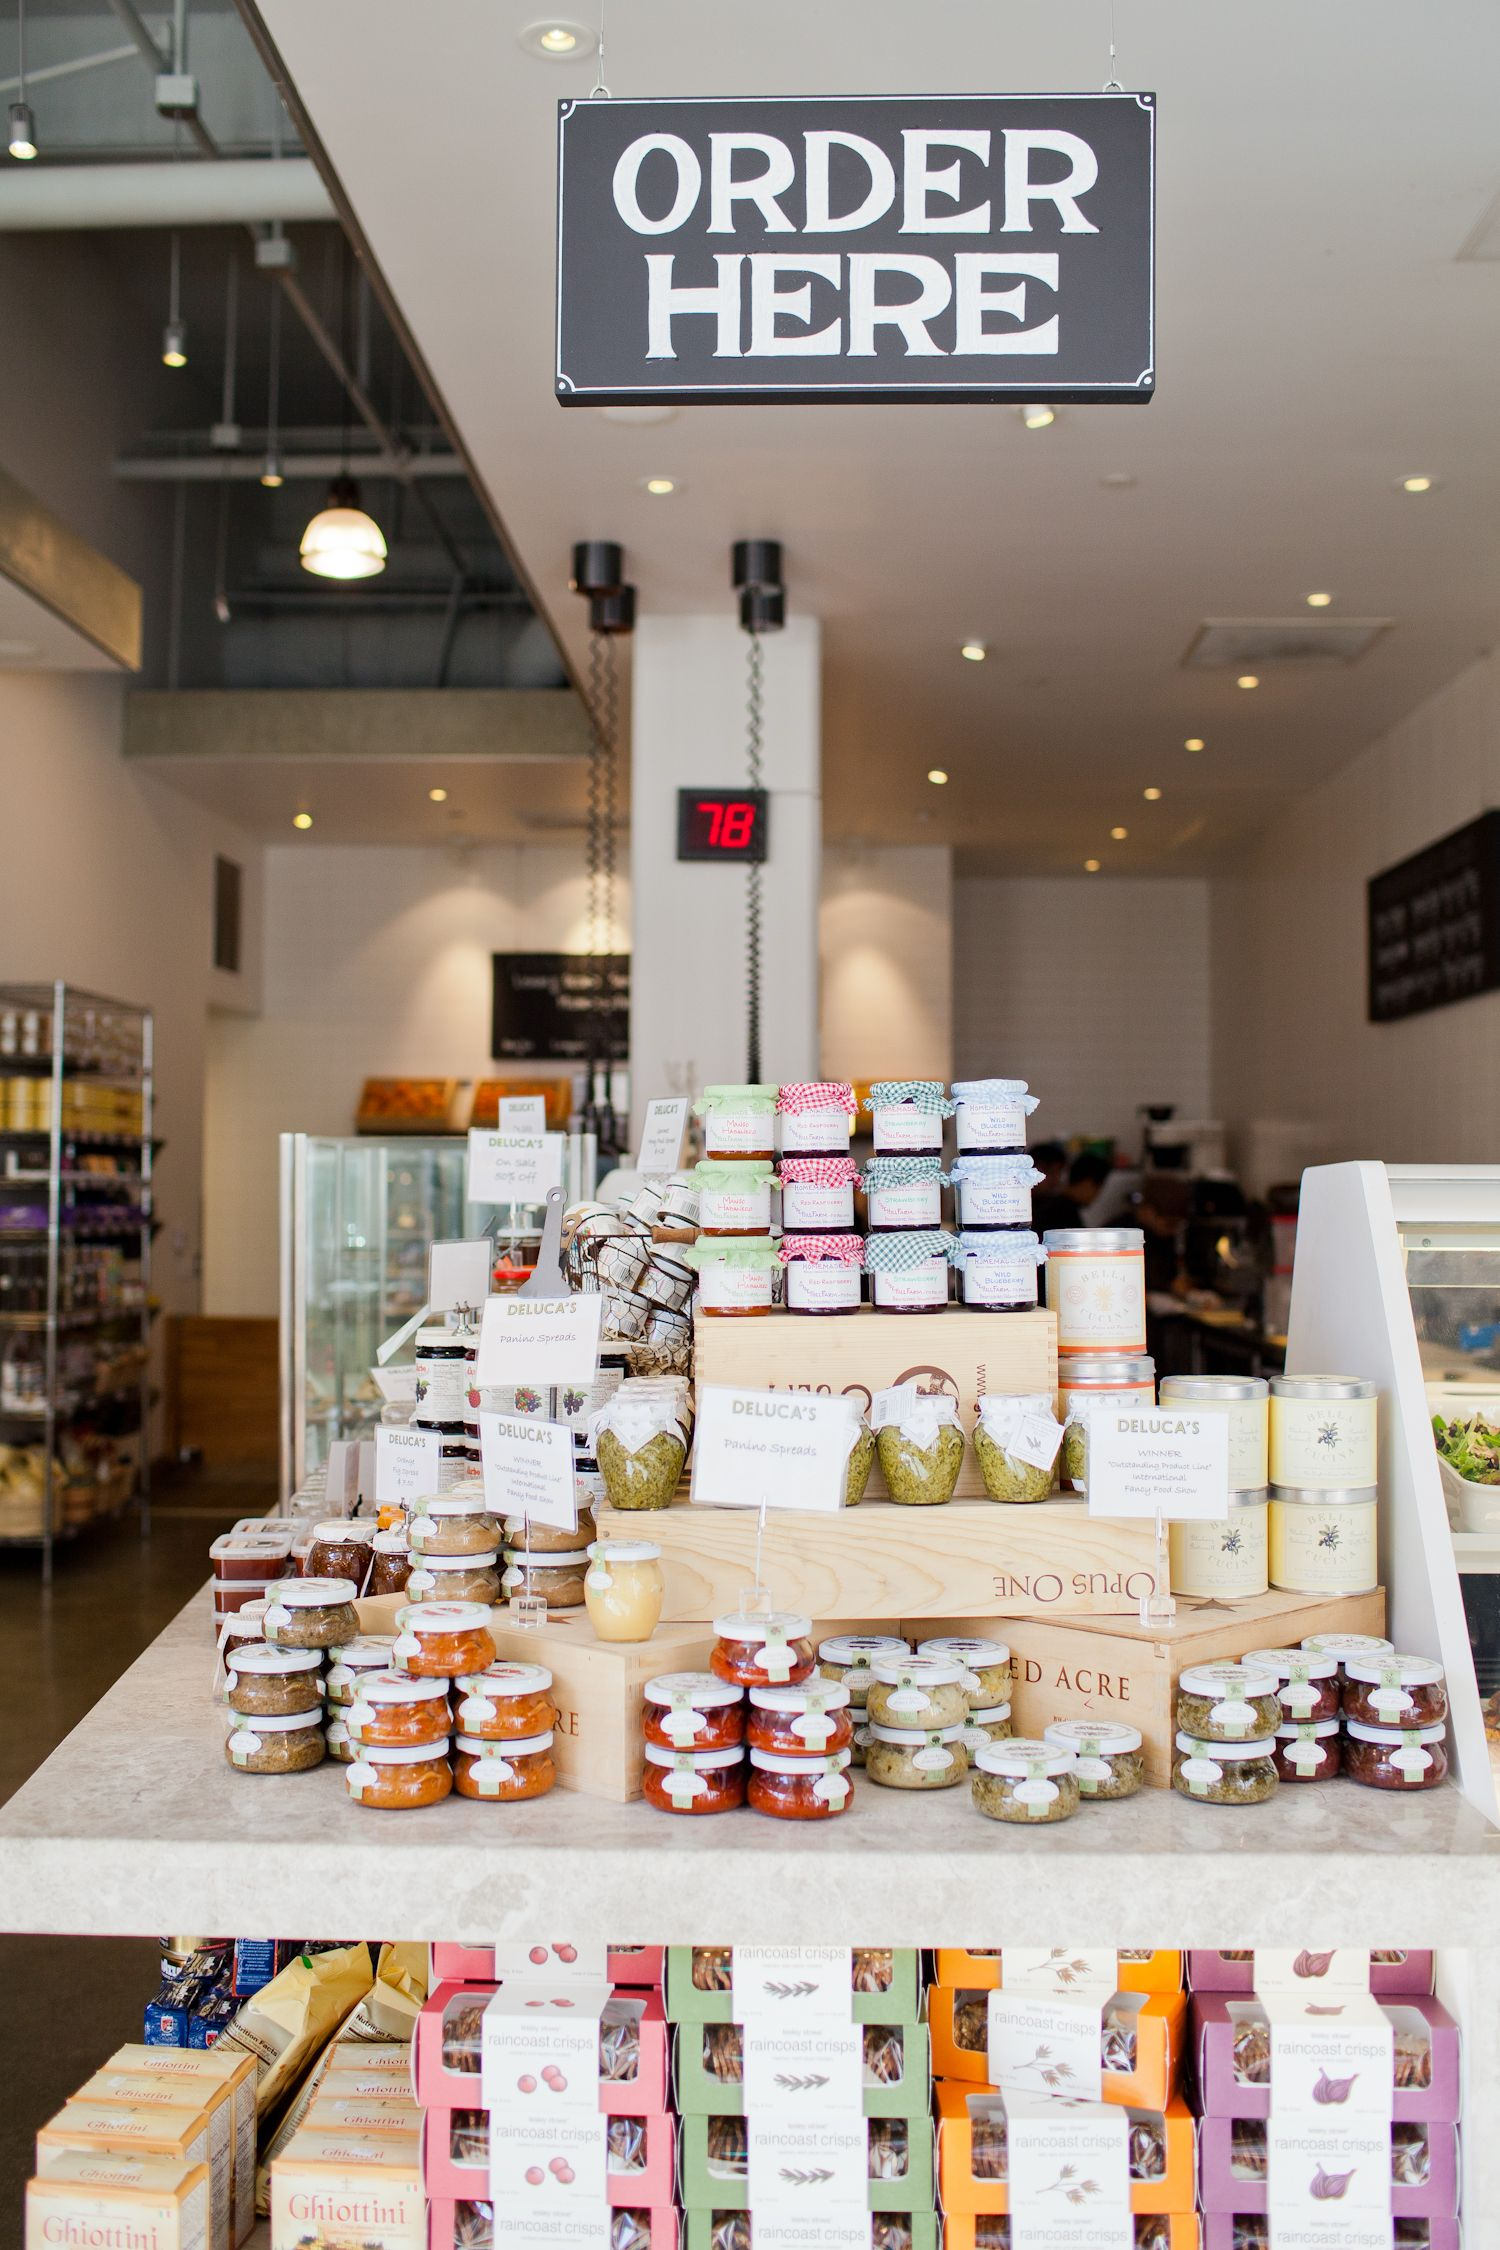 Order here at Deluca's Italian Deli at The Americana at